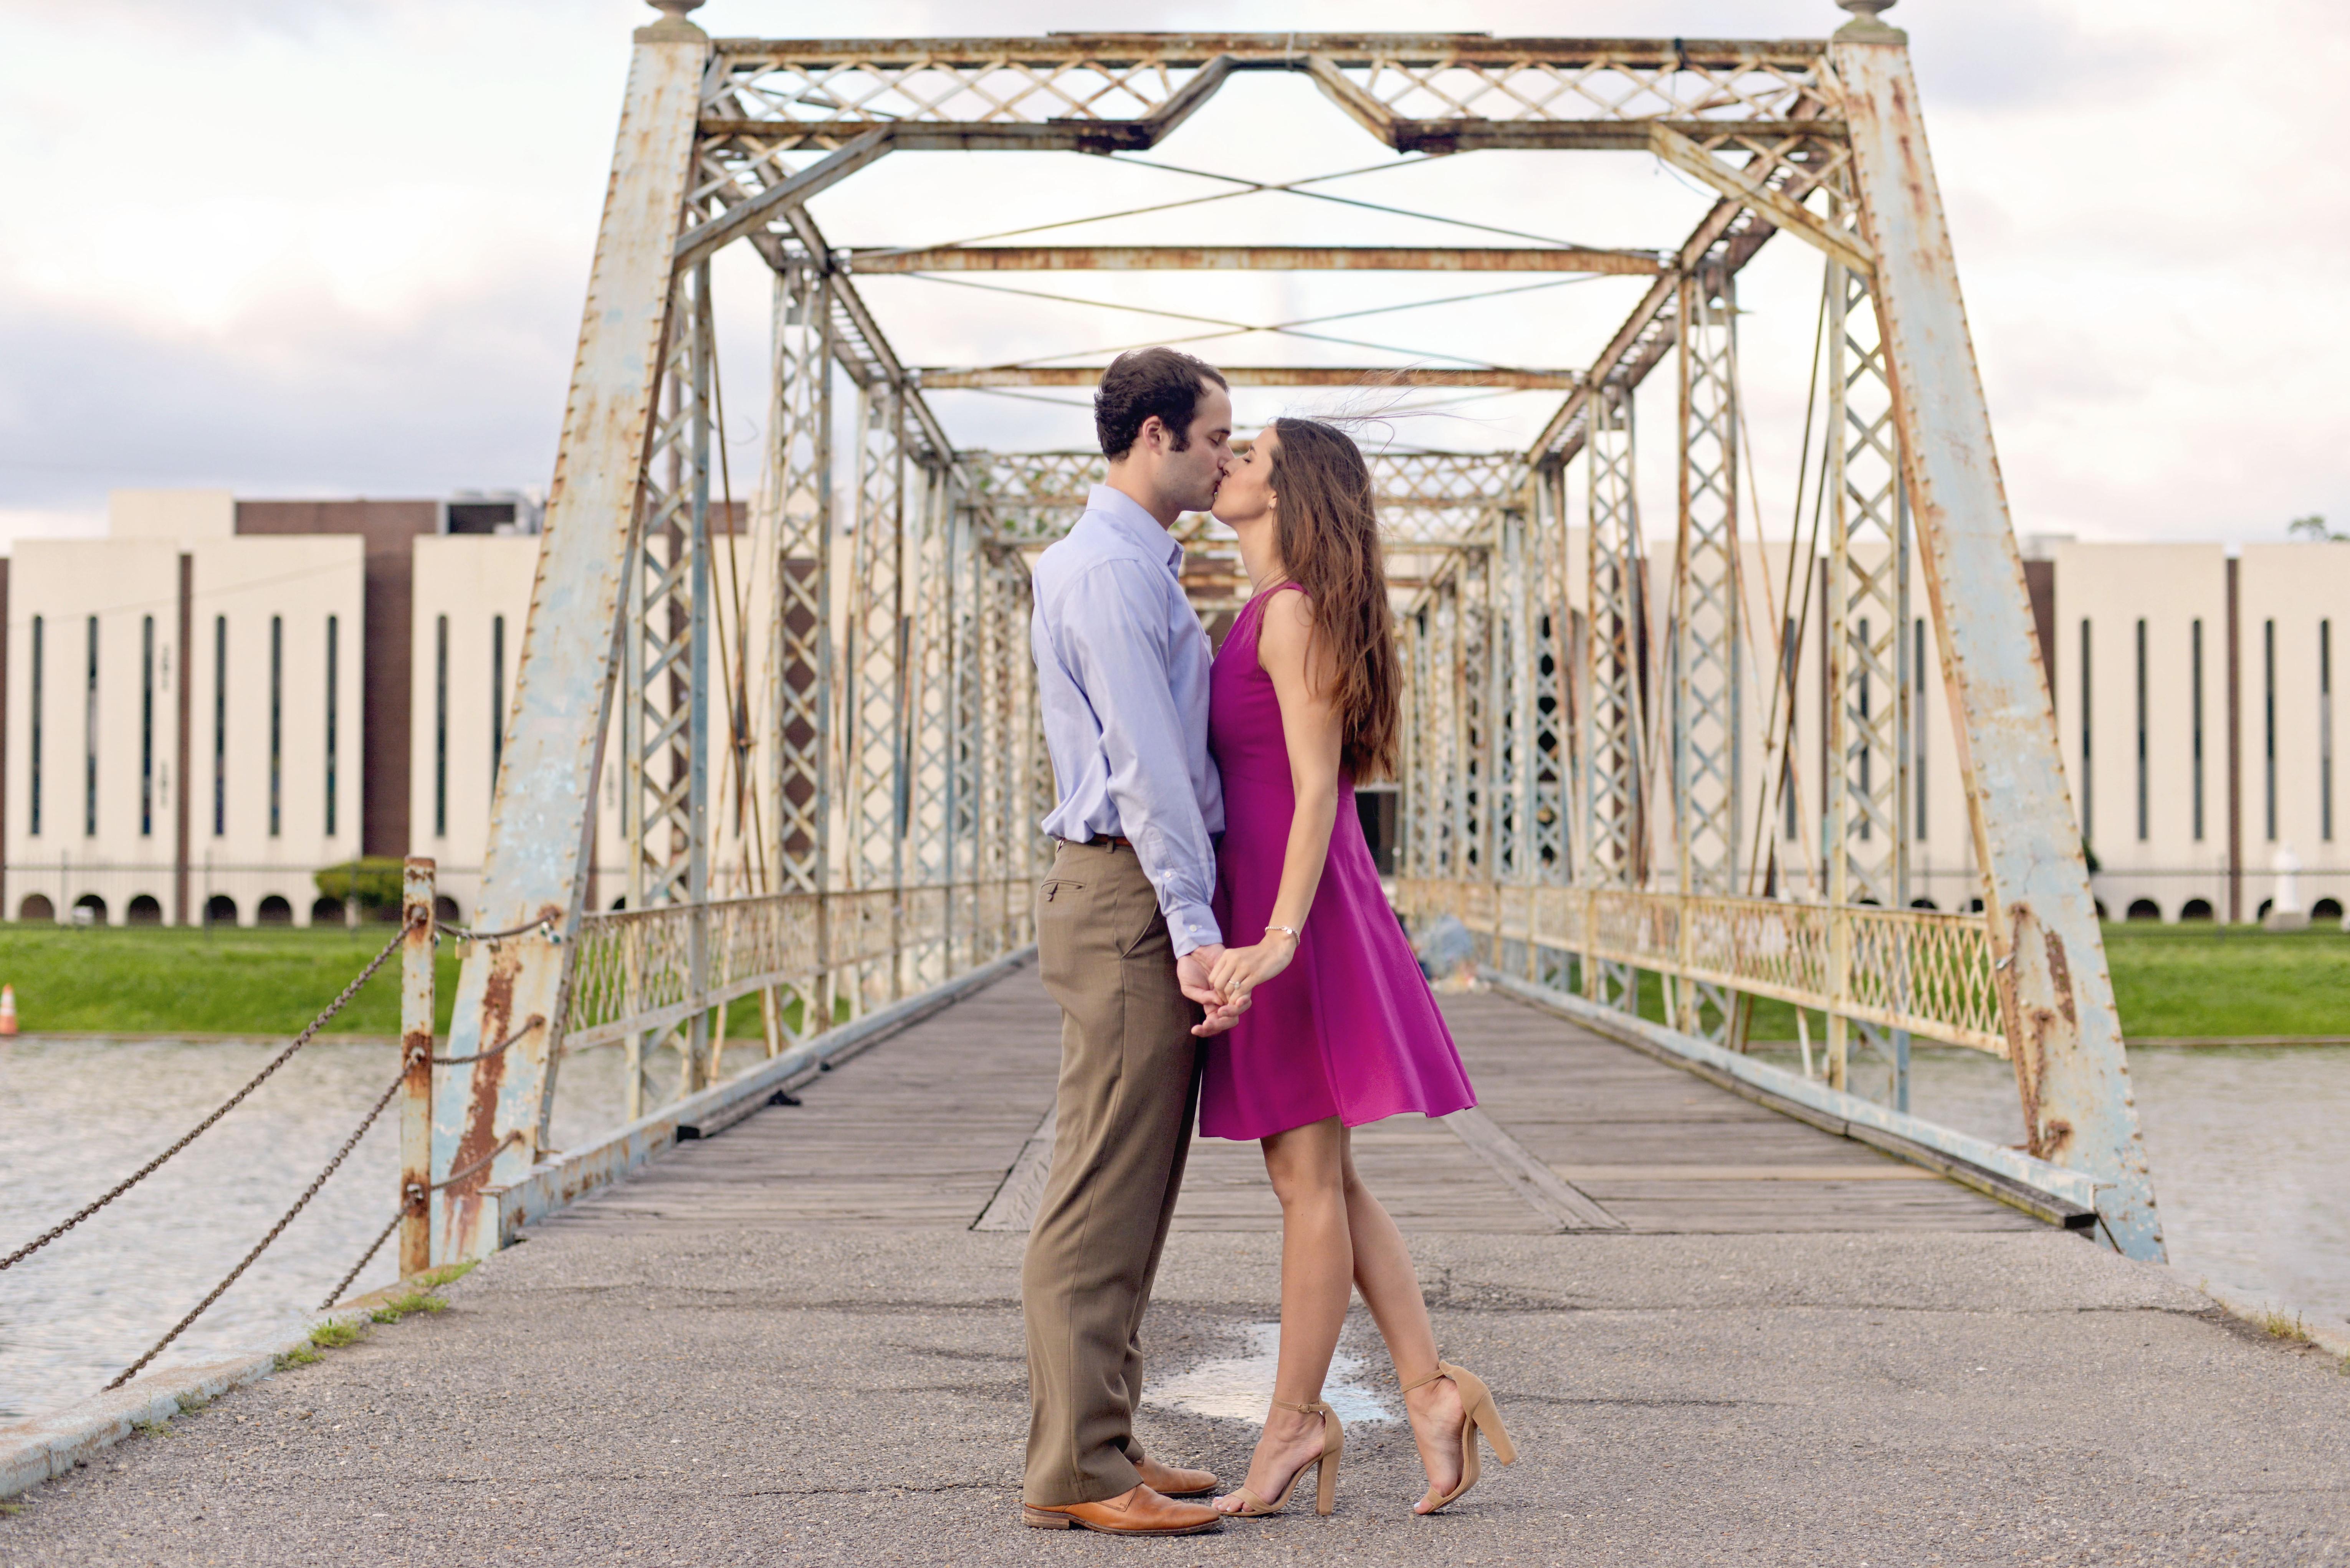 Couples/Engagement Session